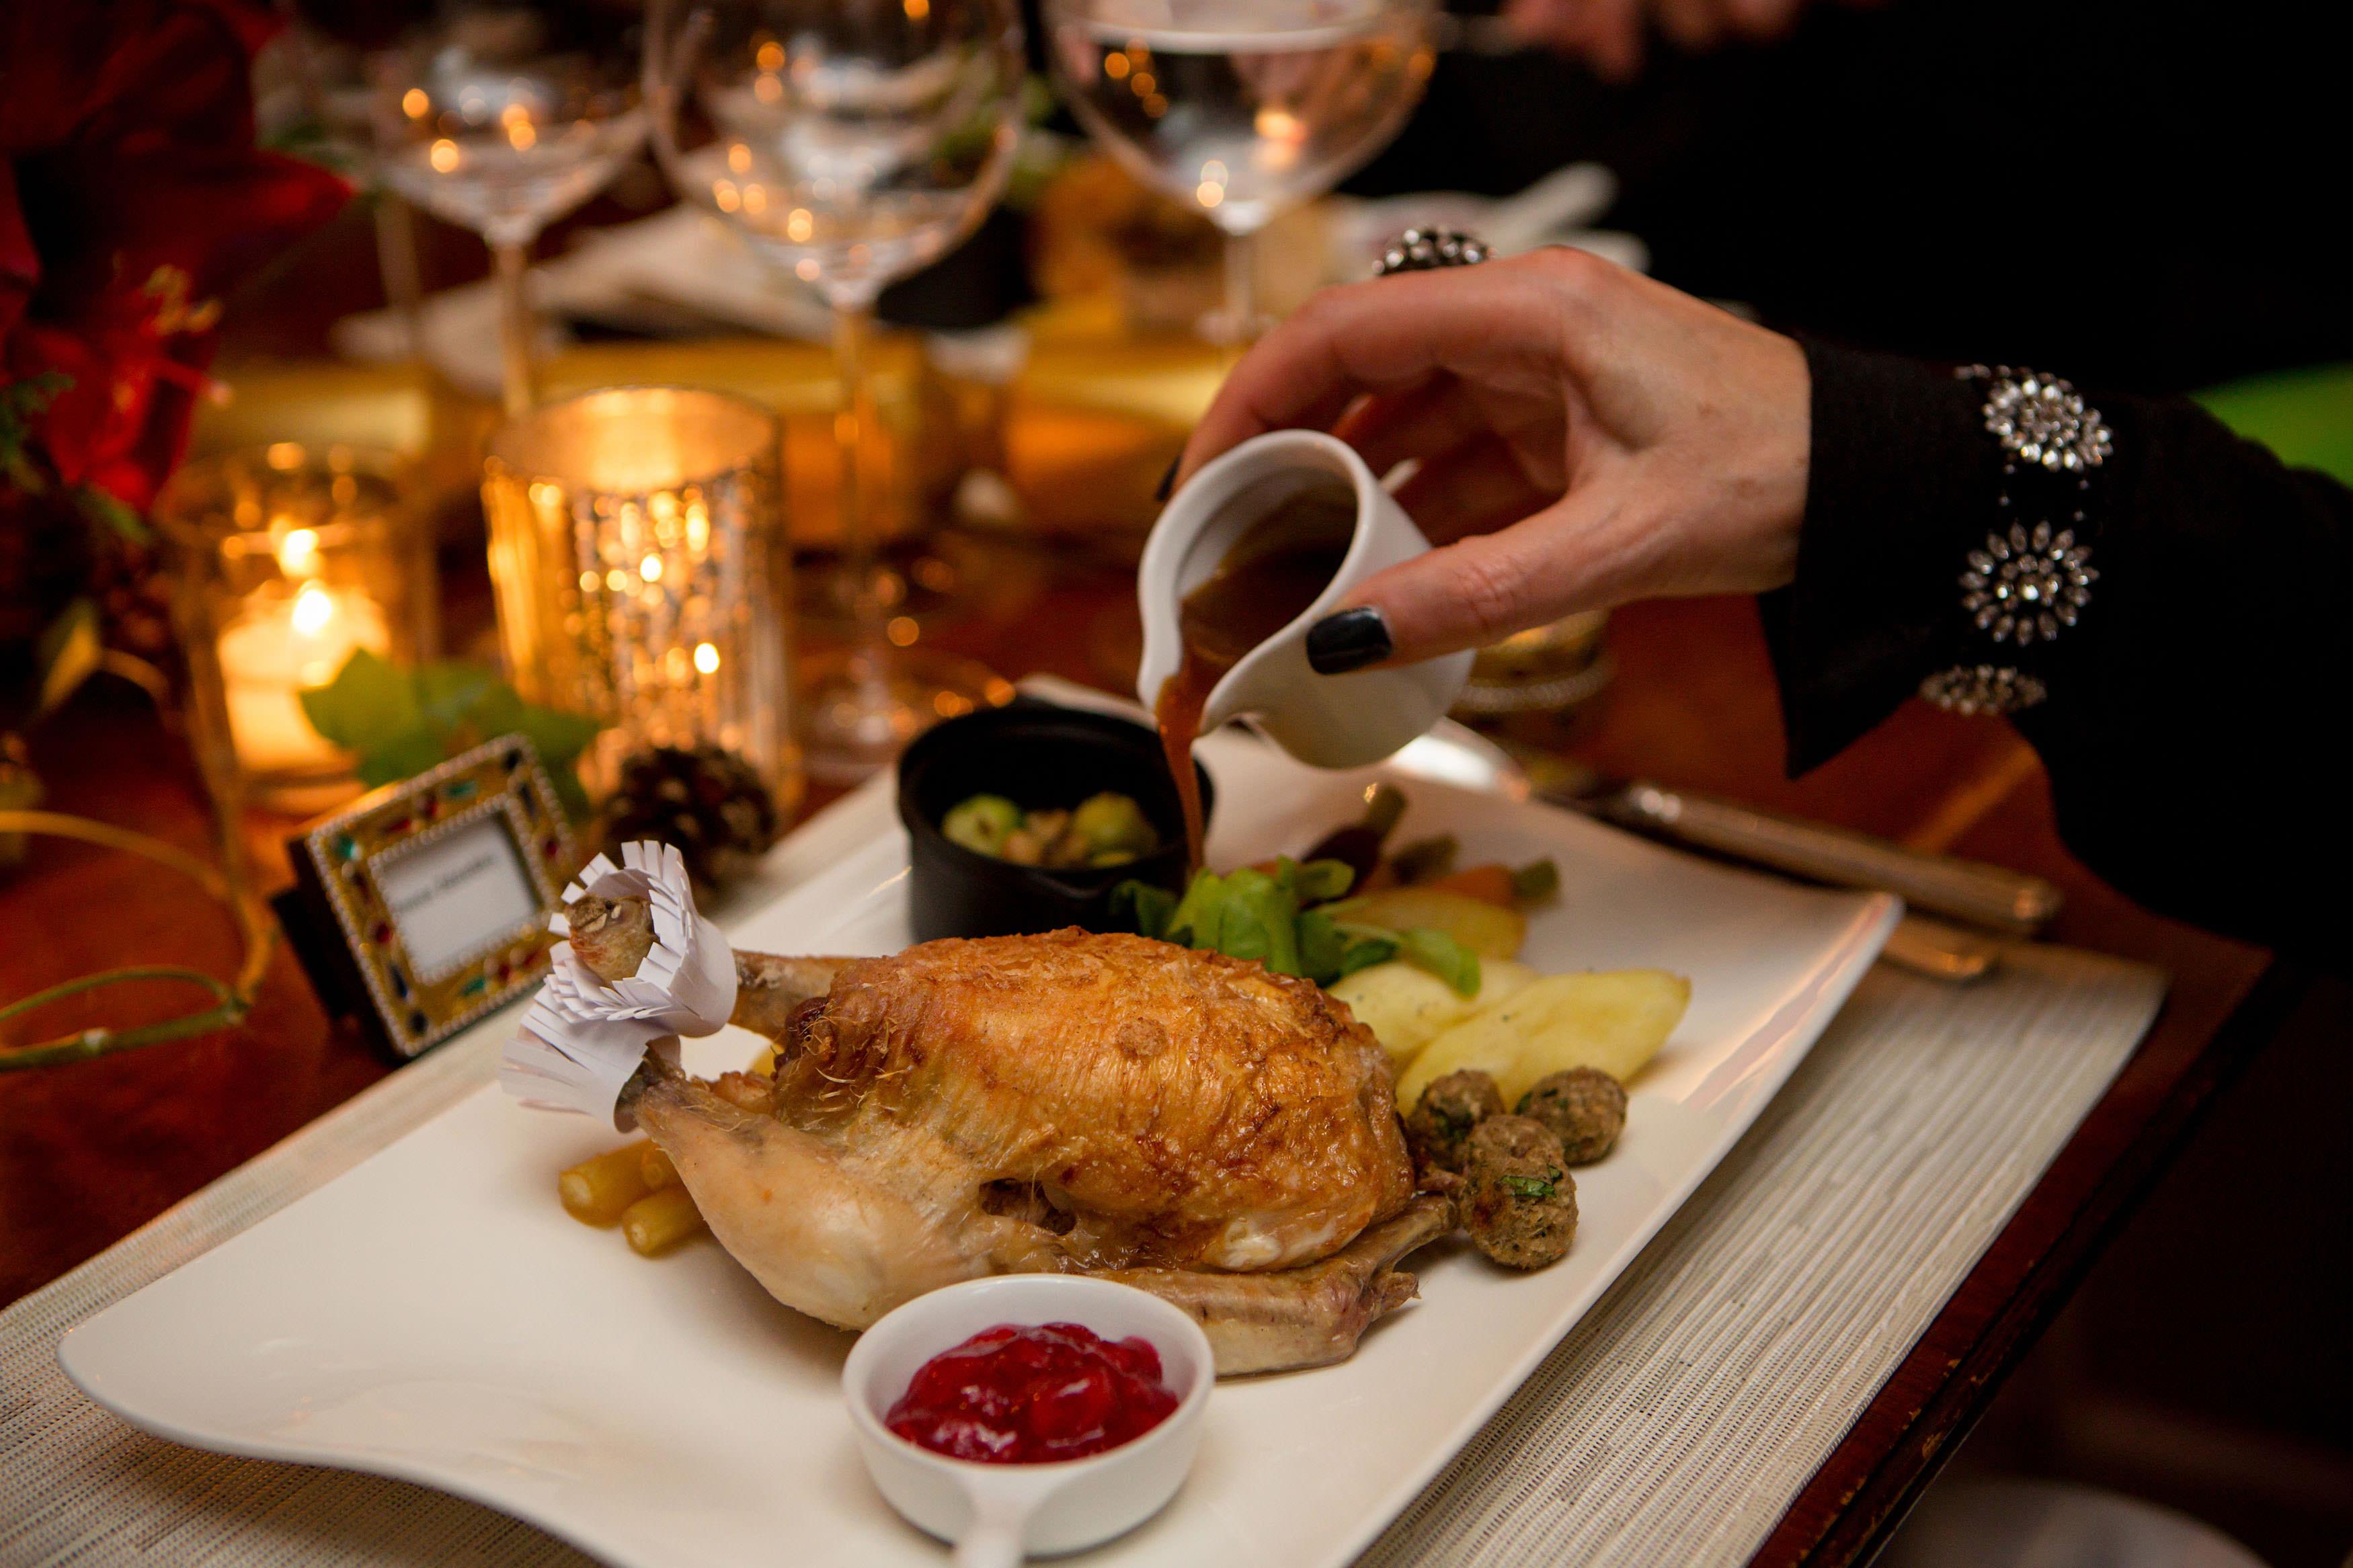 Ambassadors' Dinner - Regency Christmas Feast - 3 Bird Roast, Christmas Lunch Dine Style!